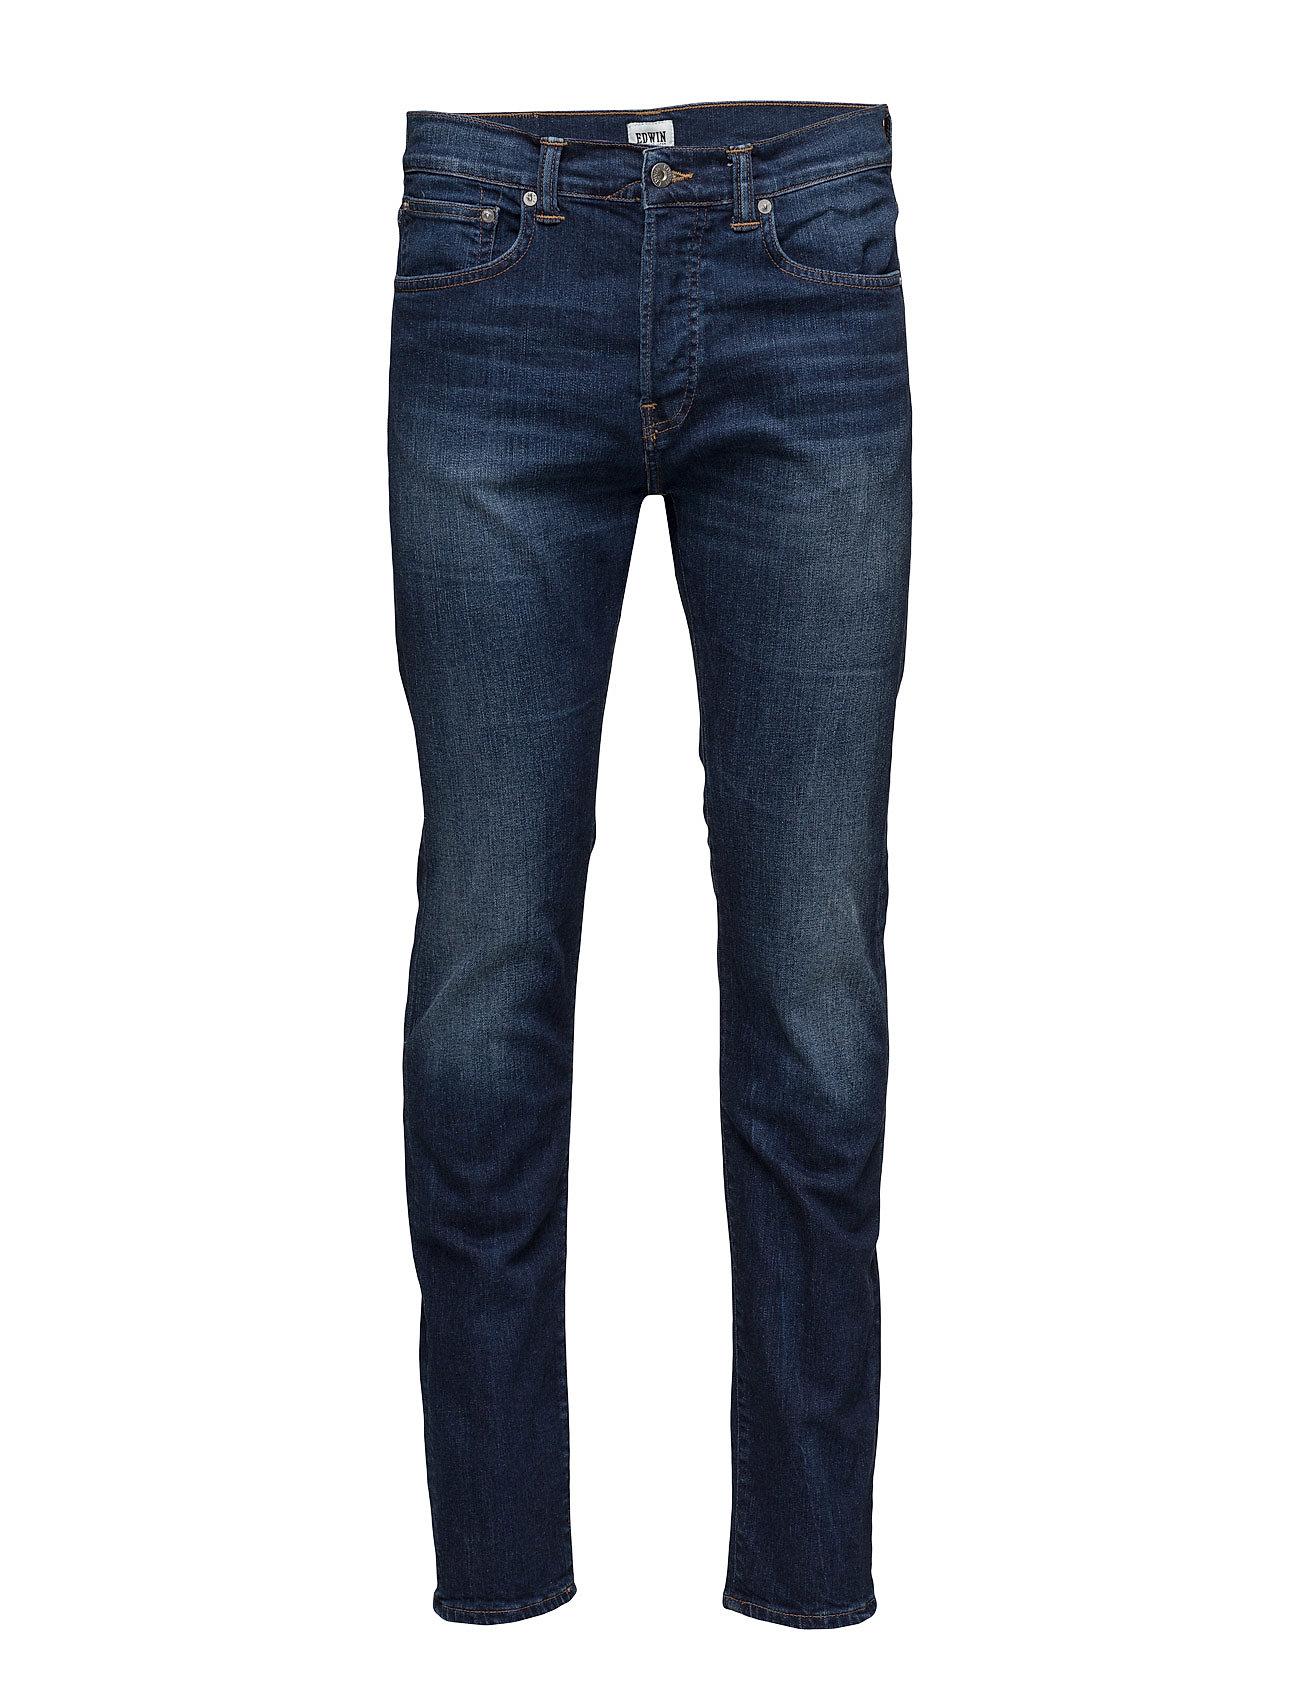 edwin – Ed-80 slim tapered jeans på boozt.com dk